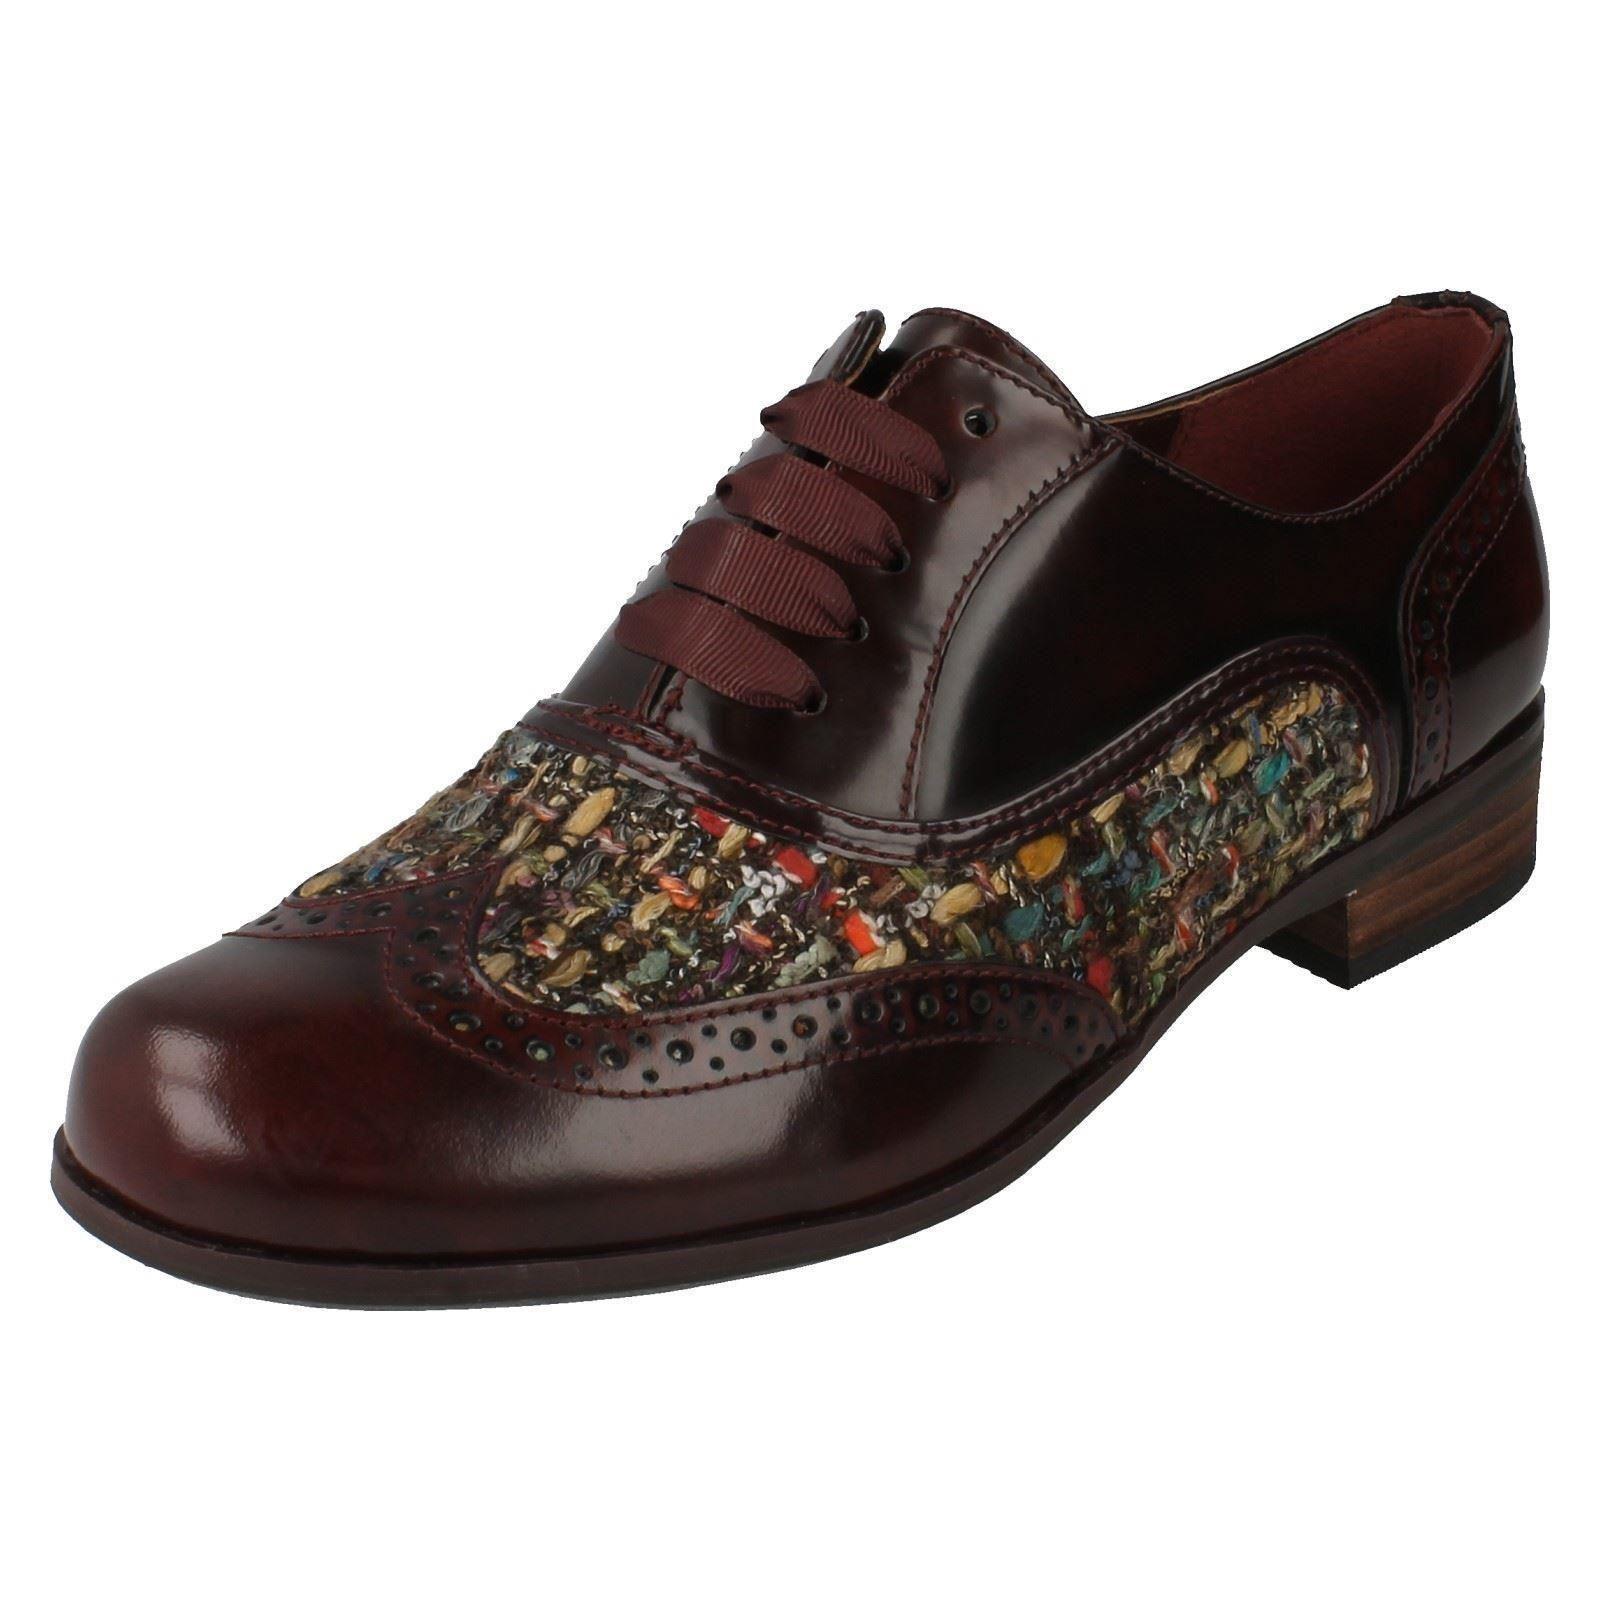 Clarks Ladies Lace Up Shoes